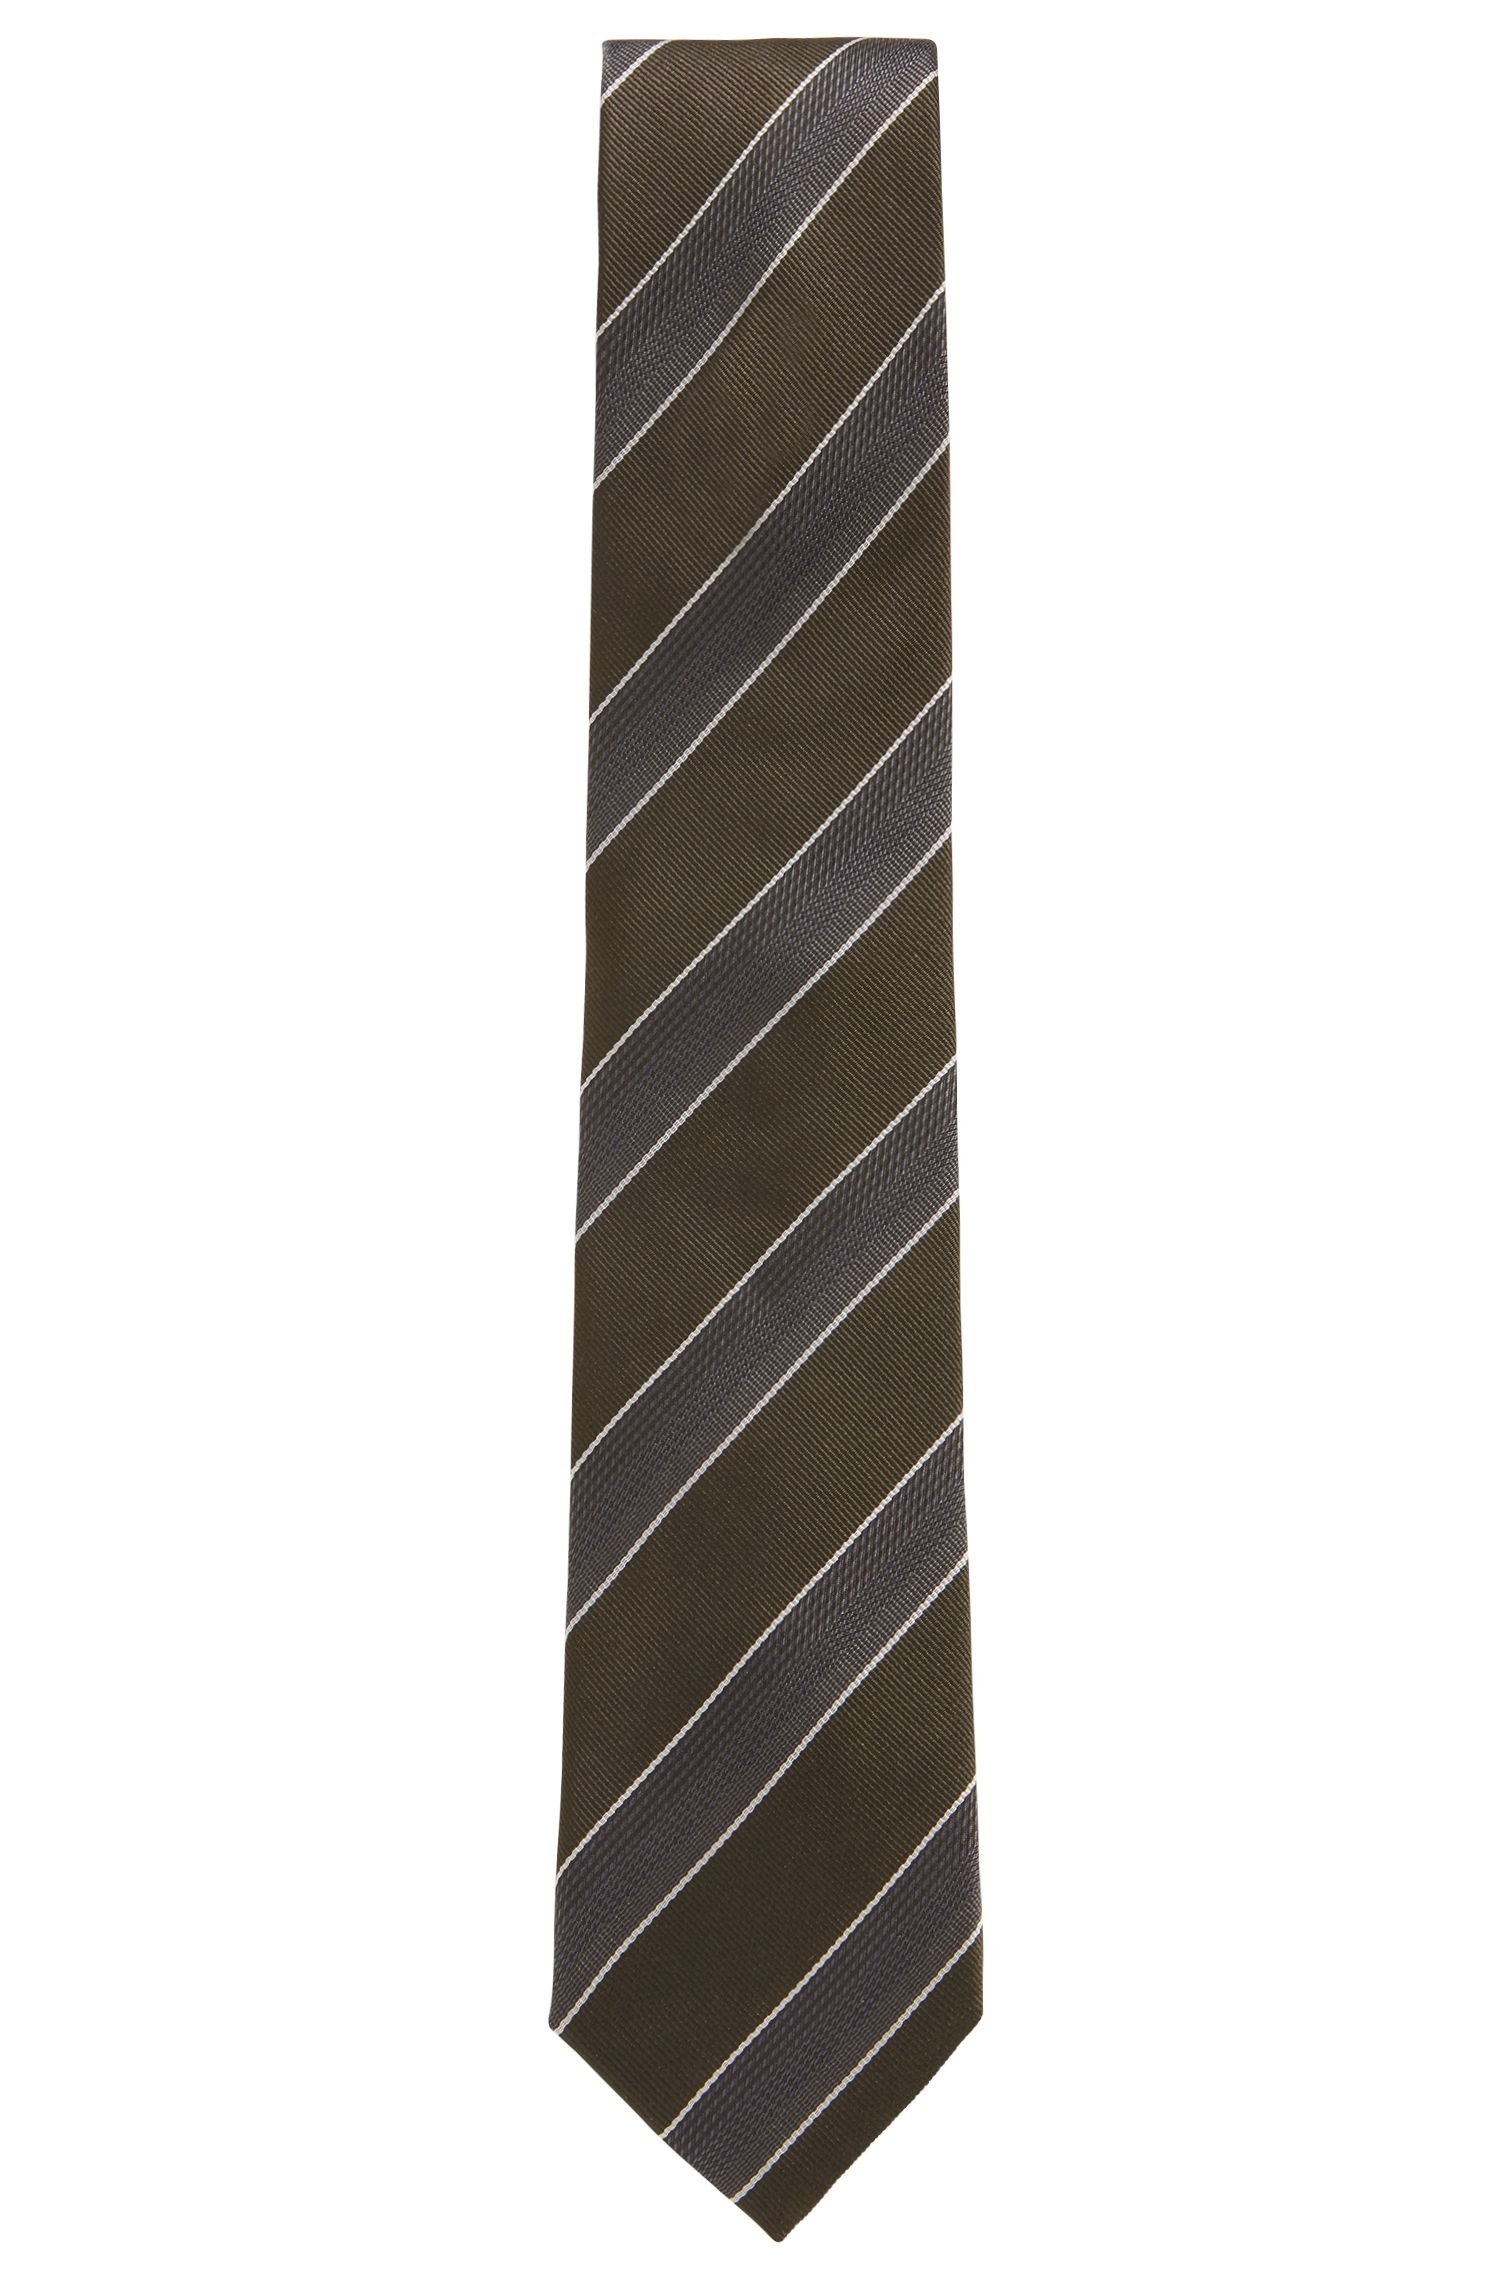 Silk jacquard tie in textured diagonal stripes, Dark Green